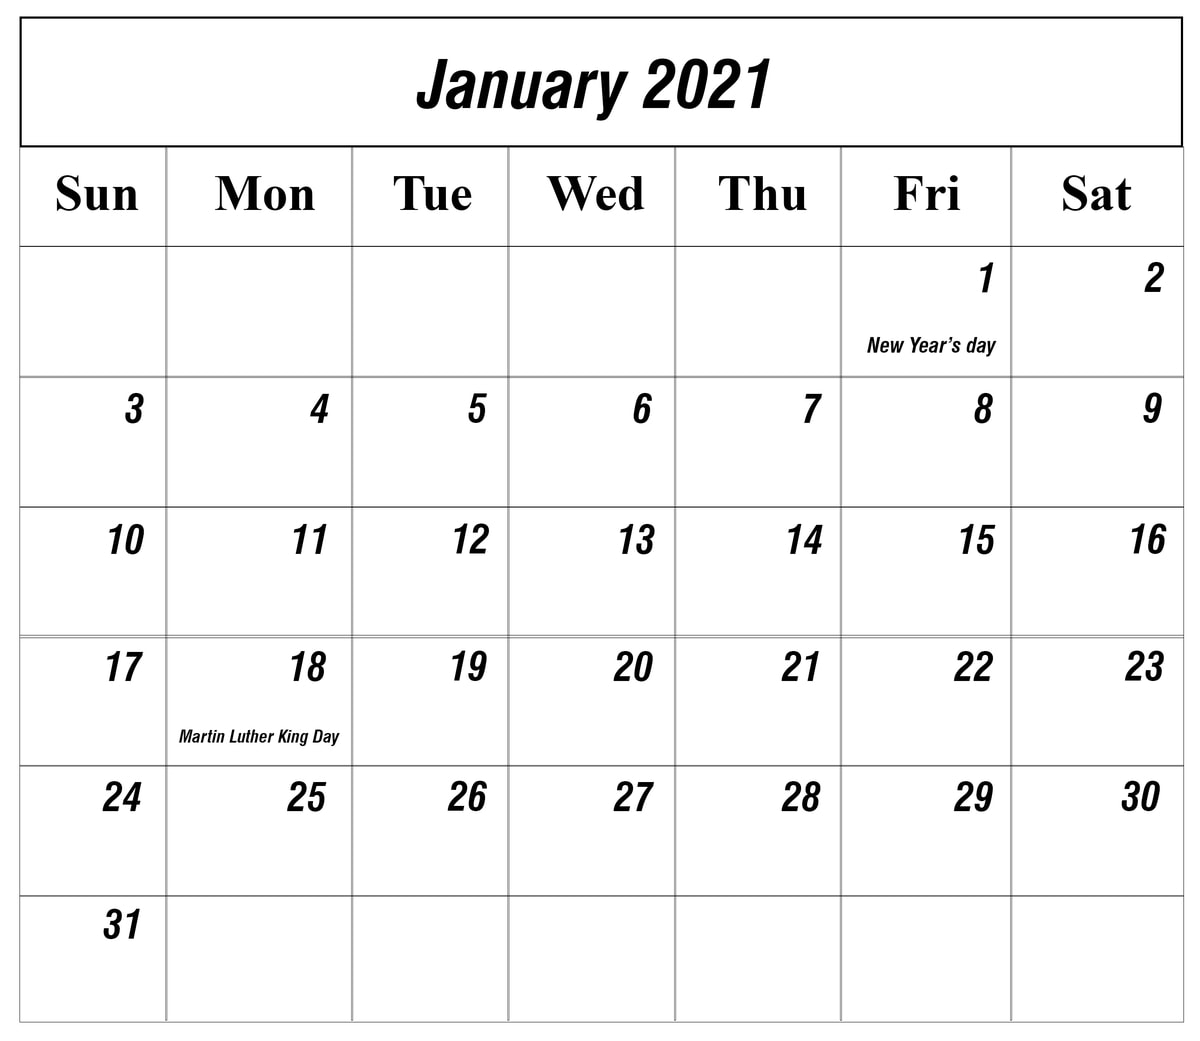 january 2021 calendar with holidays singapore